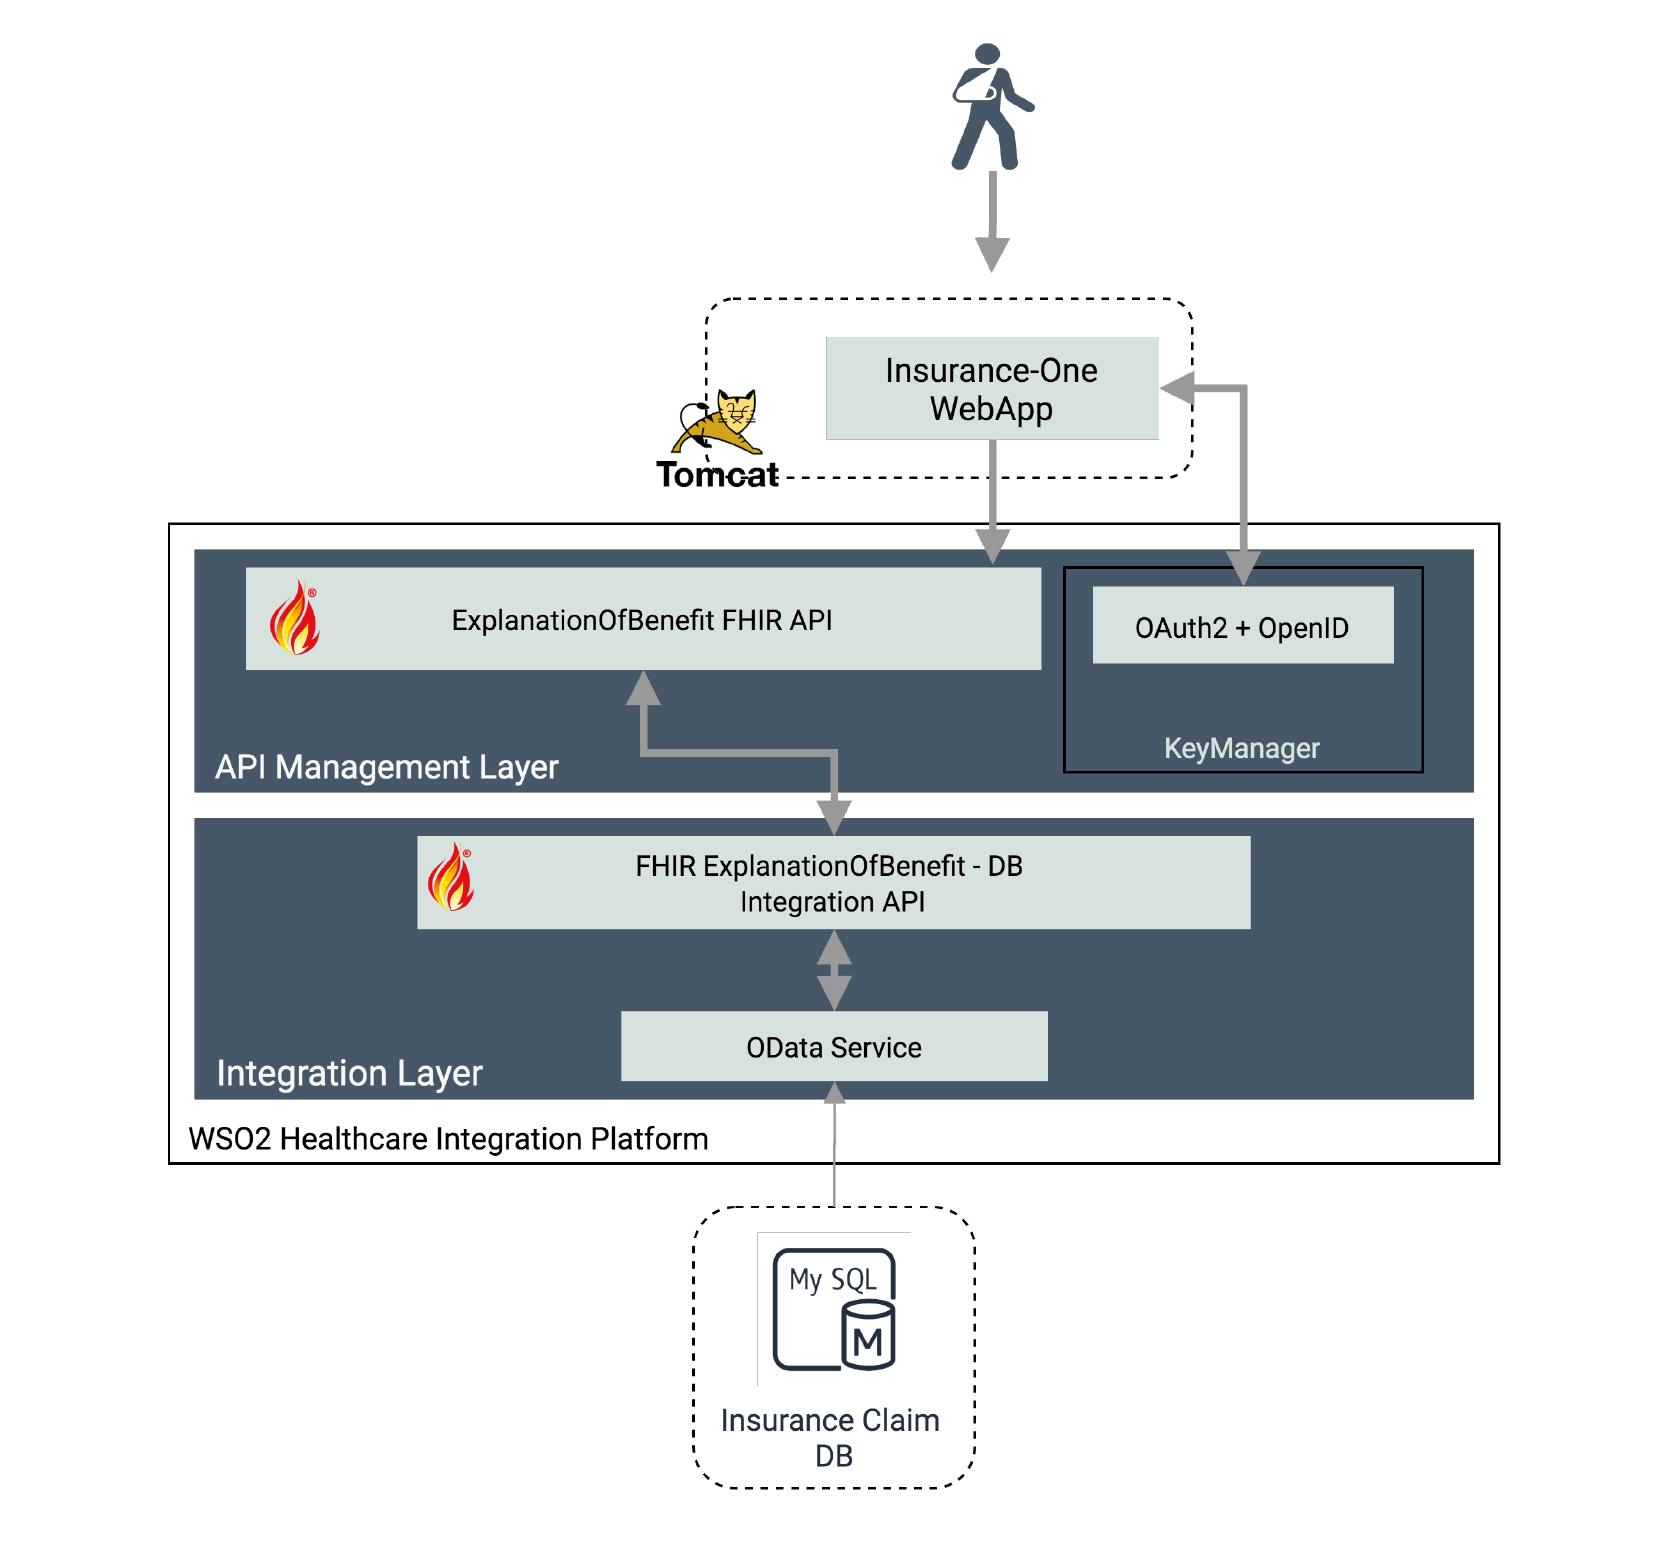 FHIR® EoB API Implementation